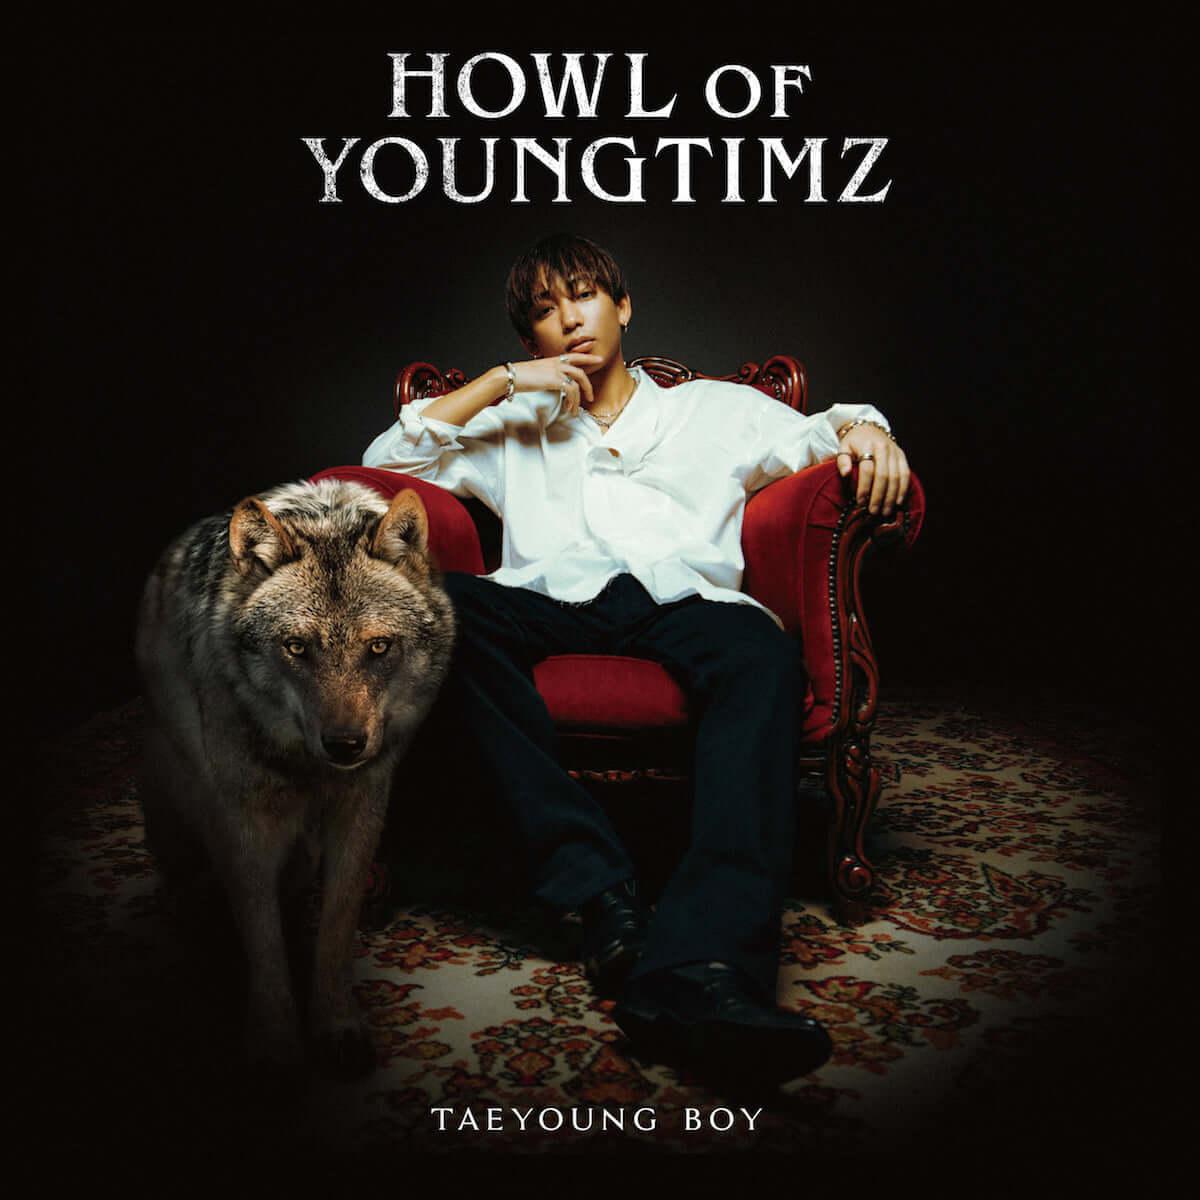 Taeyoung Boy、待望の1stアルバムが2月27日に配信スタート|Chaki ZuluやKM、Tohji、Droittteらが参加 music190220-taeyoungboy-2-1200x1200